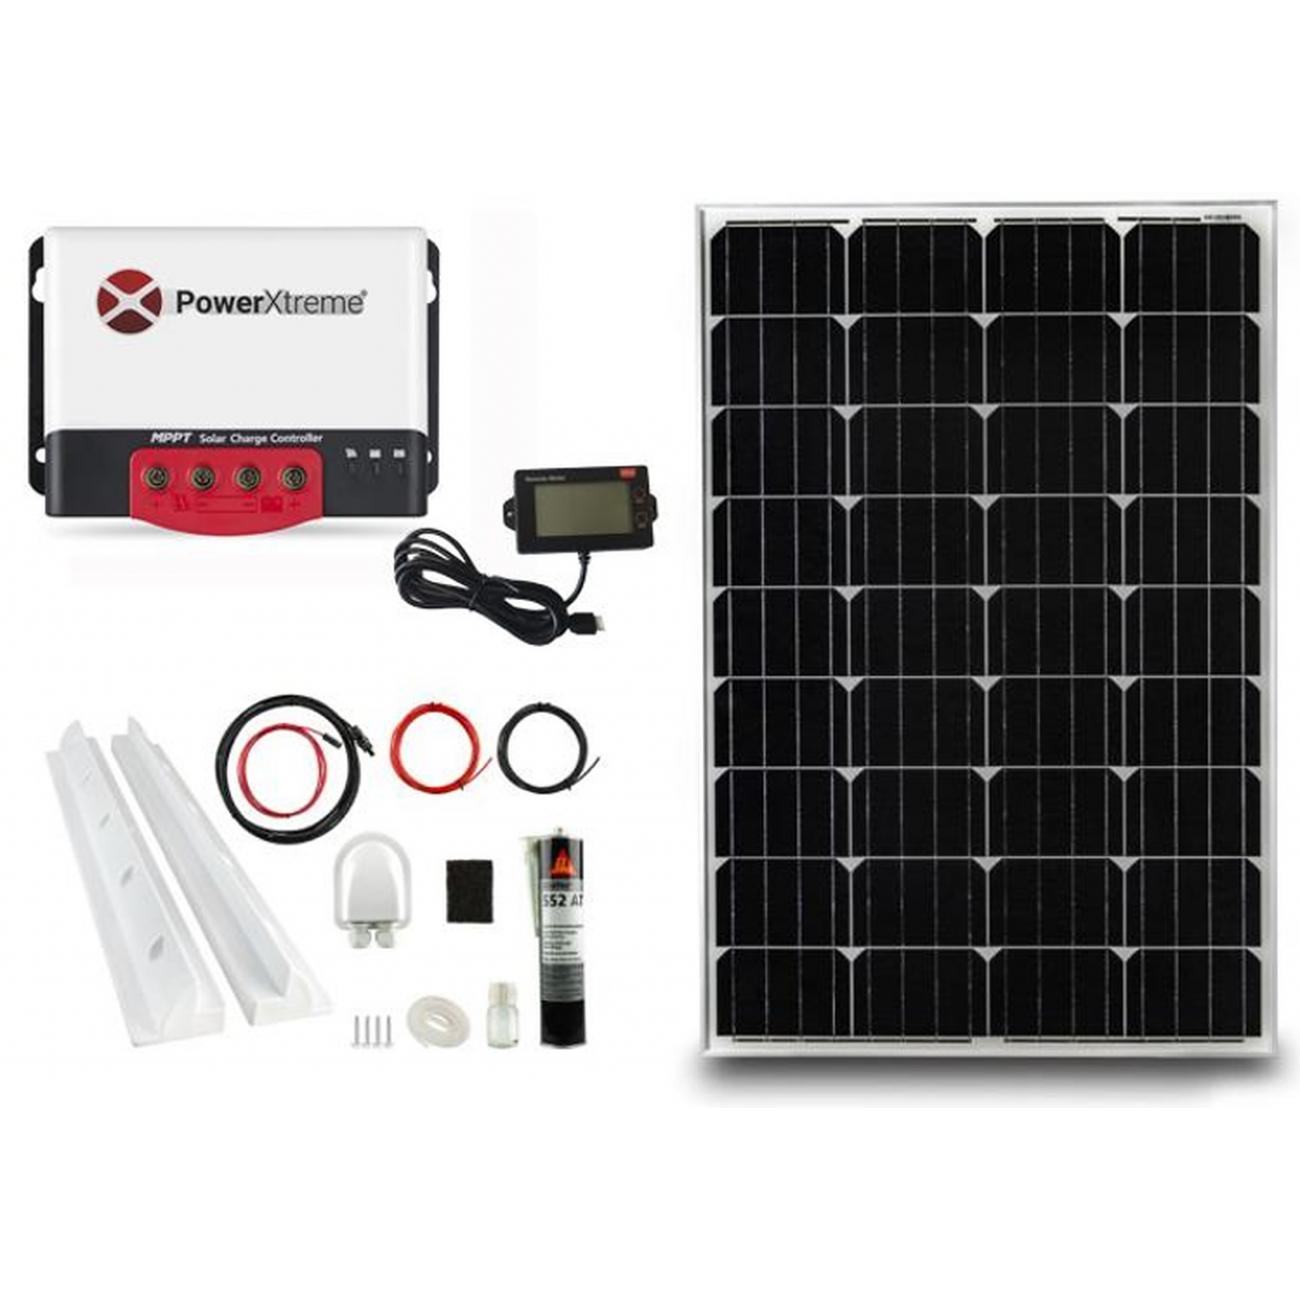 MPPT Solar Laderegler PowerXtreme XS20s Mit Display 130W Paket